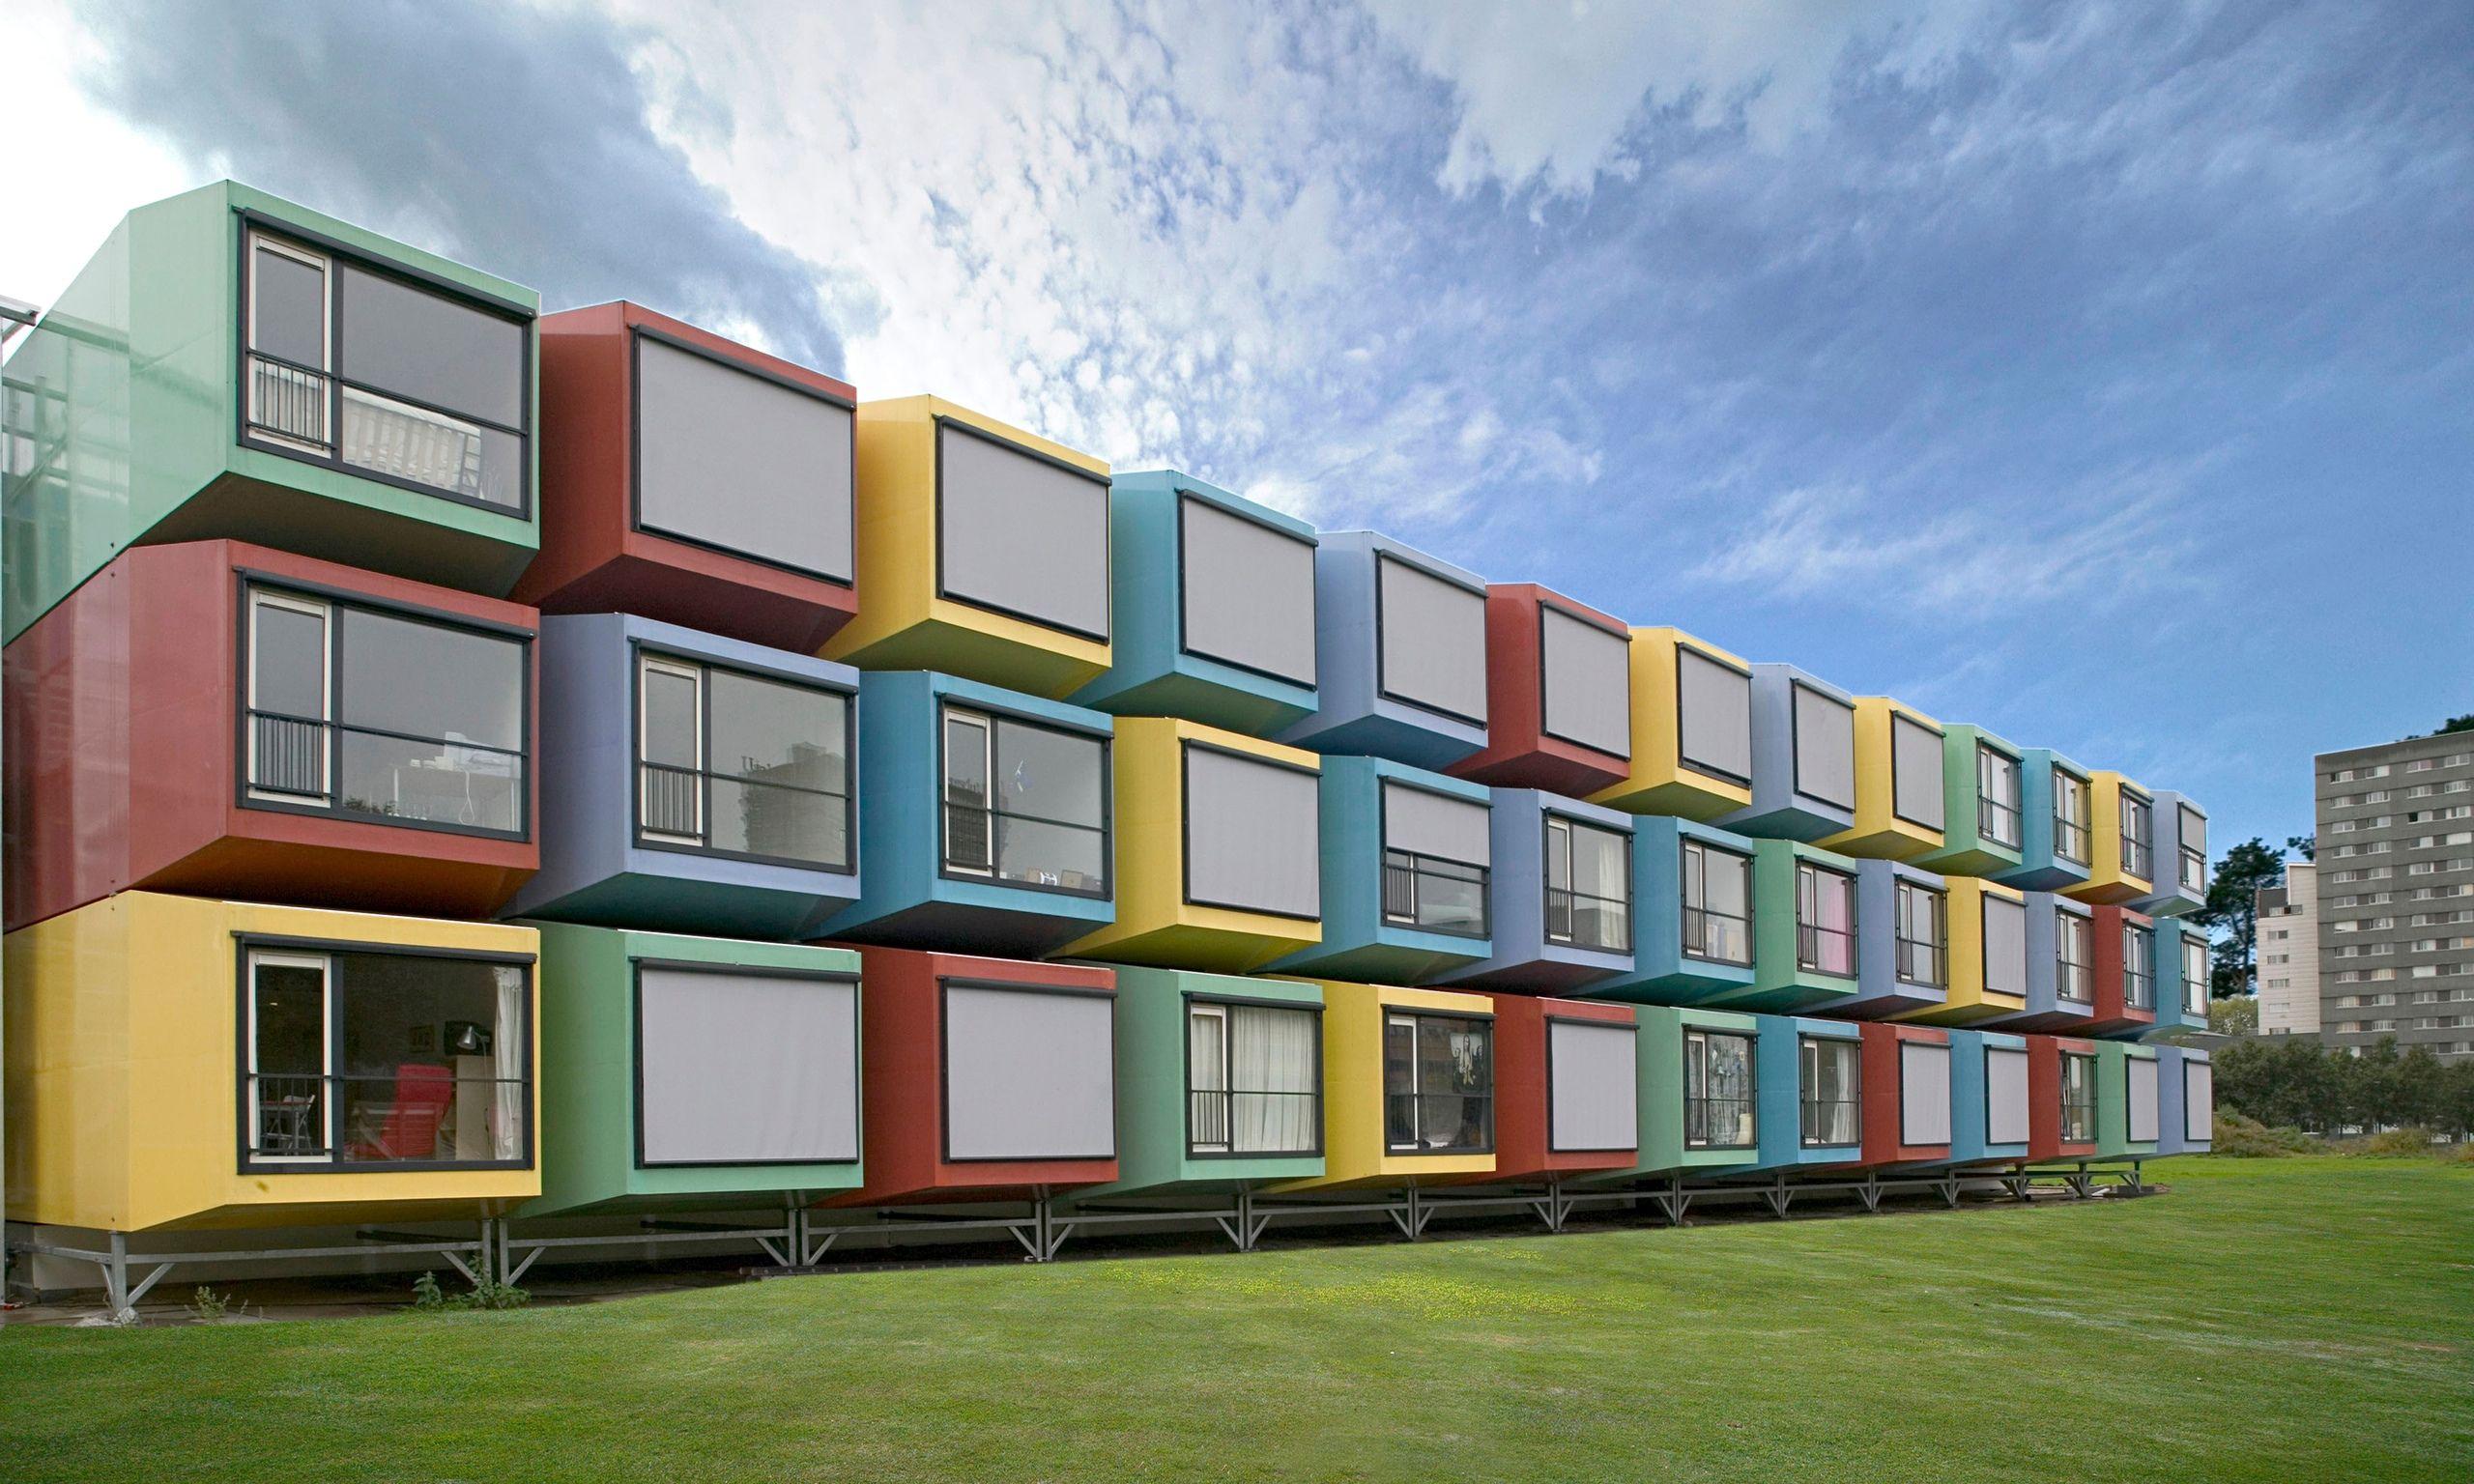 Student Housing 014 Jpg 2560 215 1536 Architecture